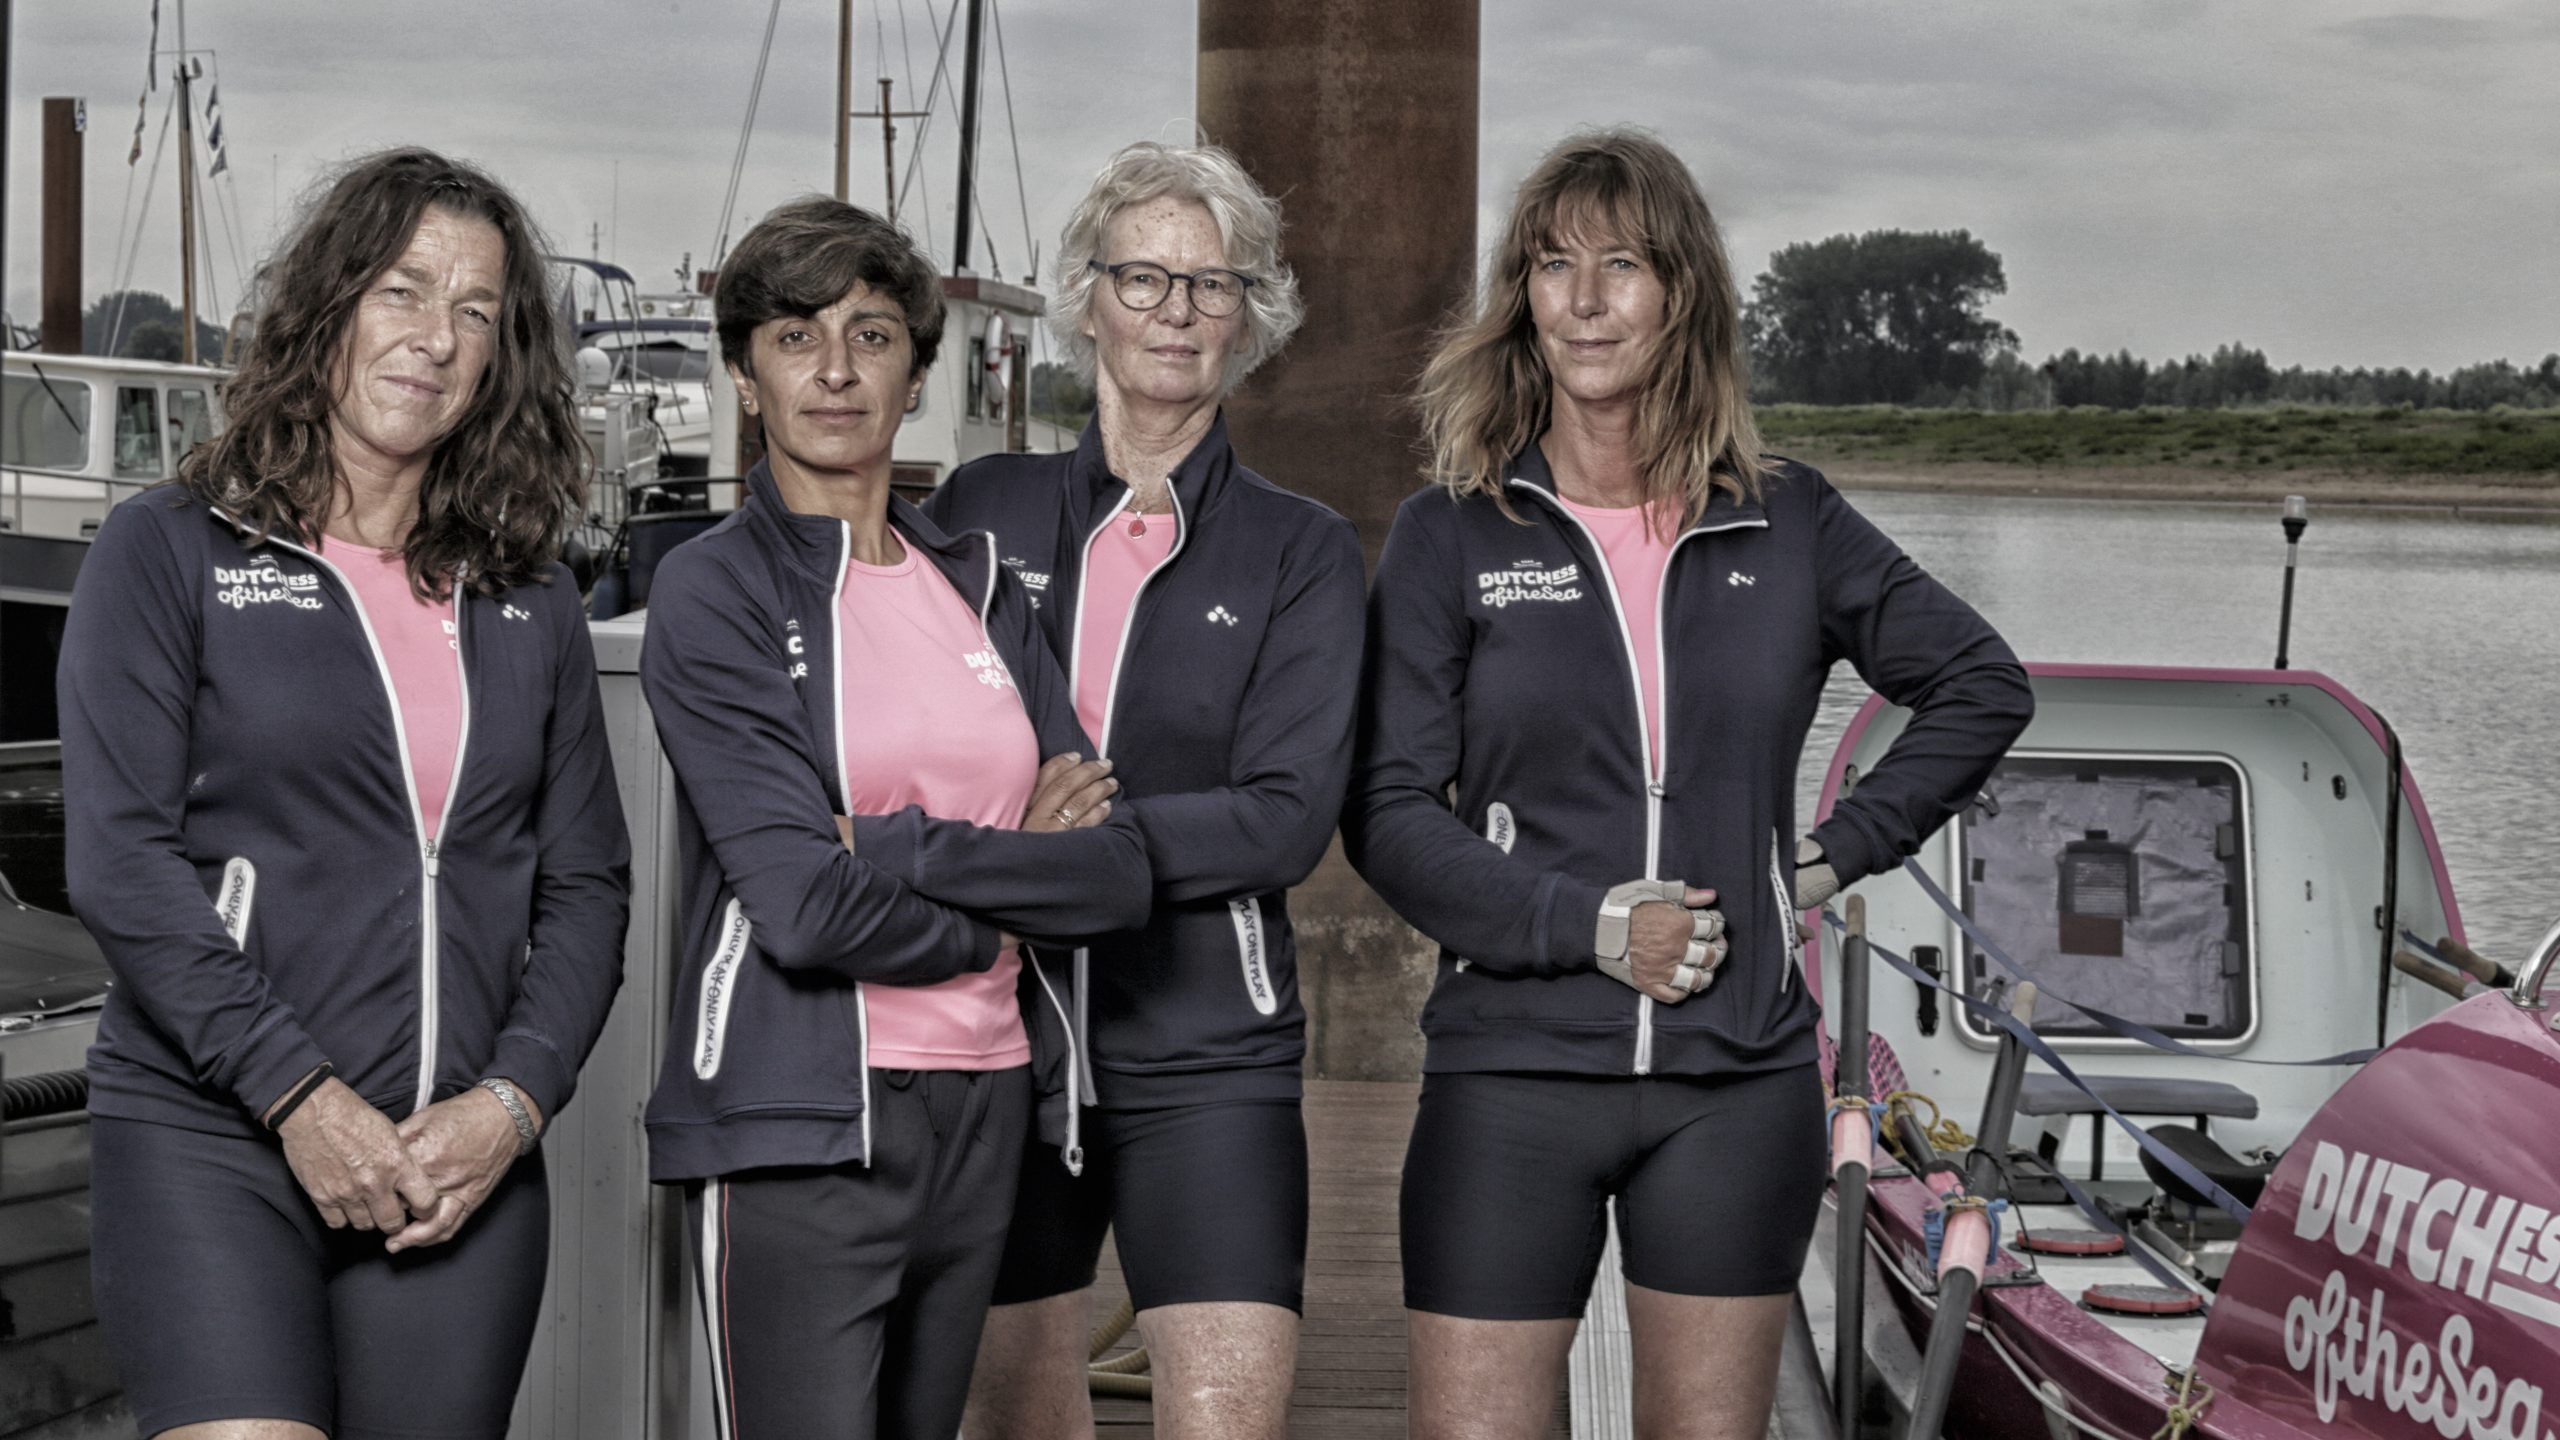 team dutchess of the sea